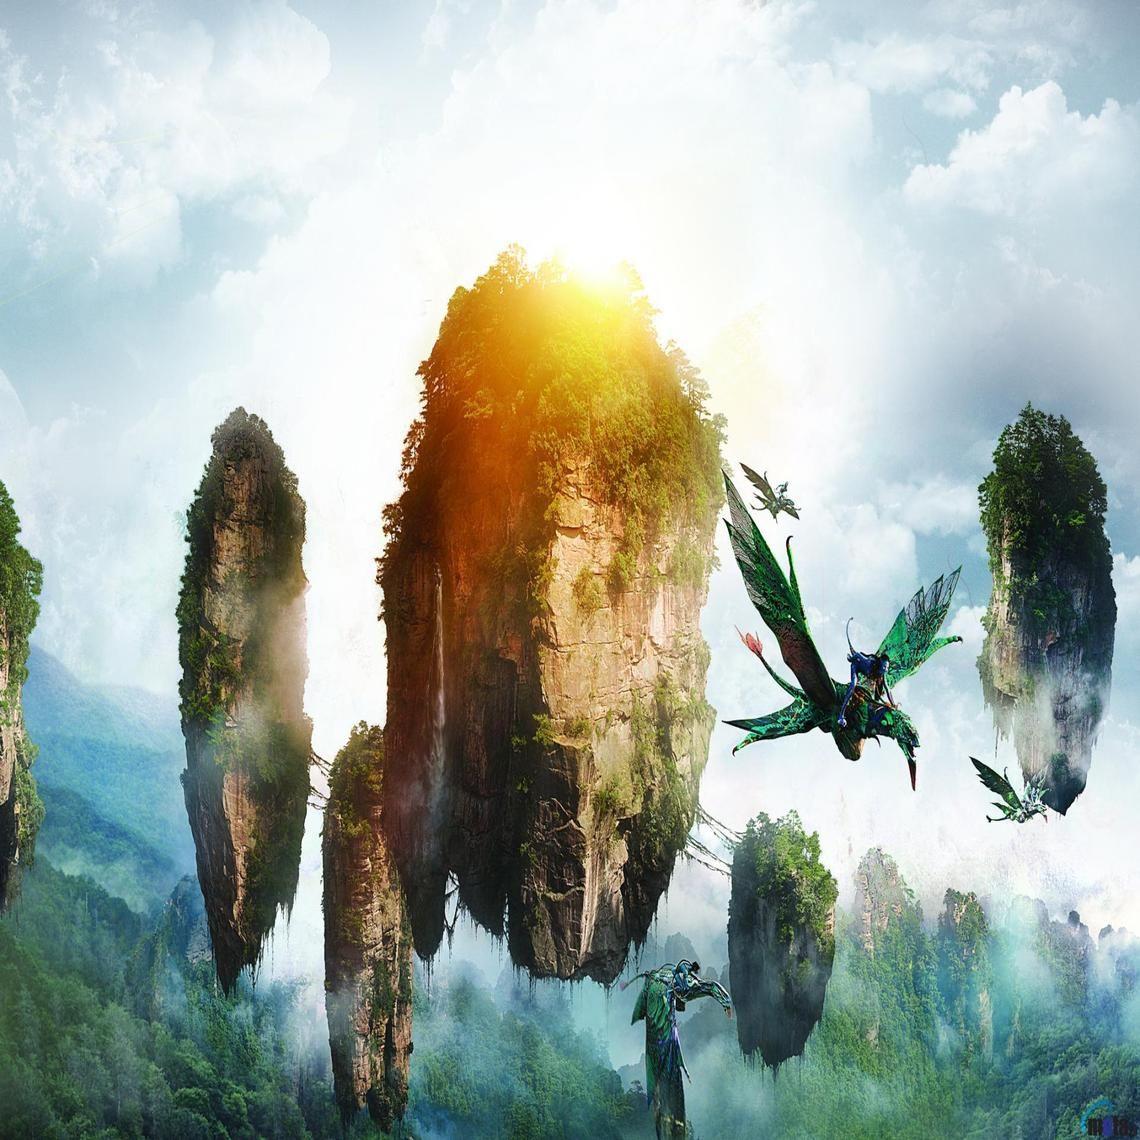 Avatar Pandora Landscape: Flying Islands On Pandora (Avatar)